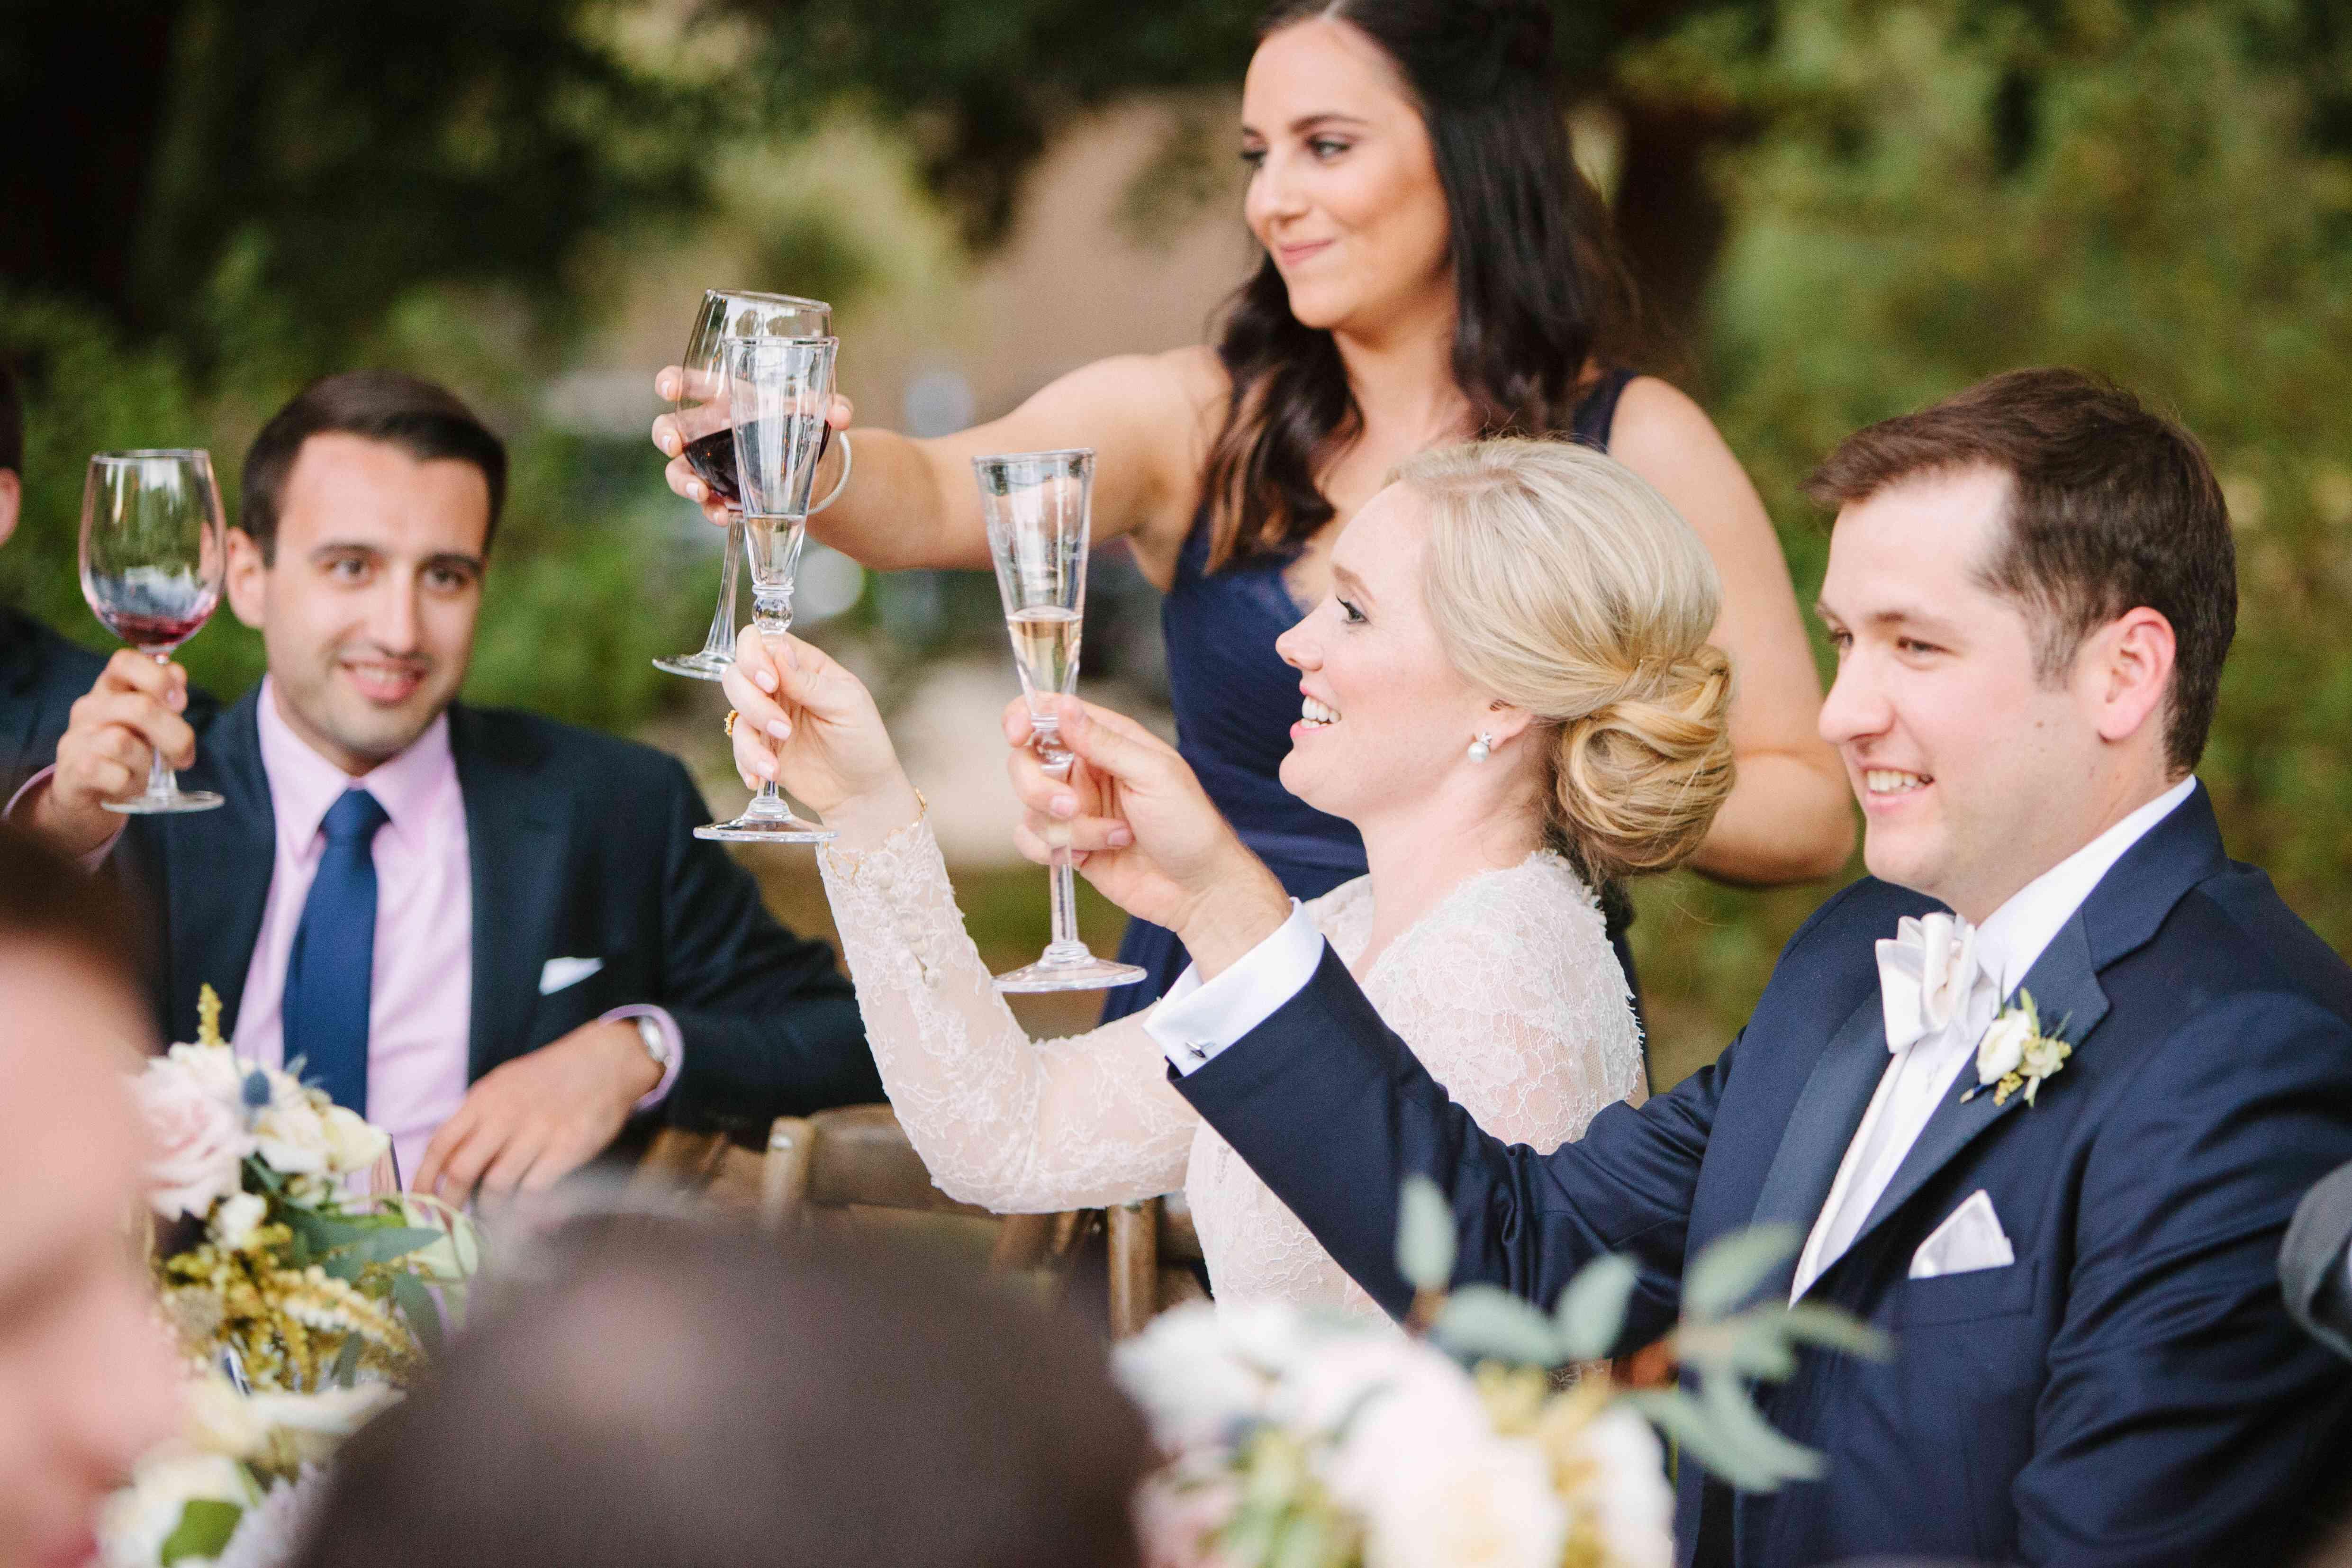 Bride and groom cheers toast